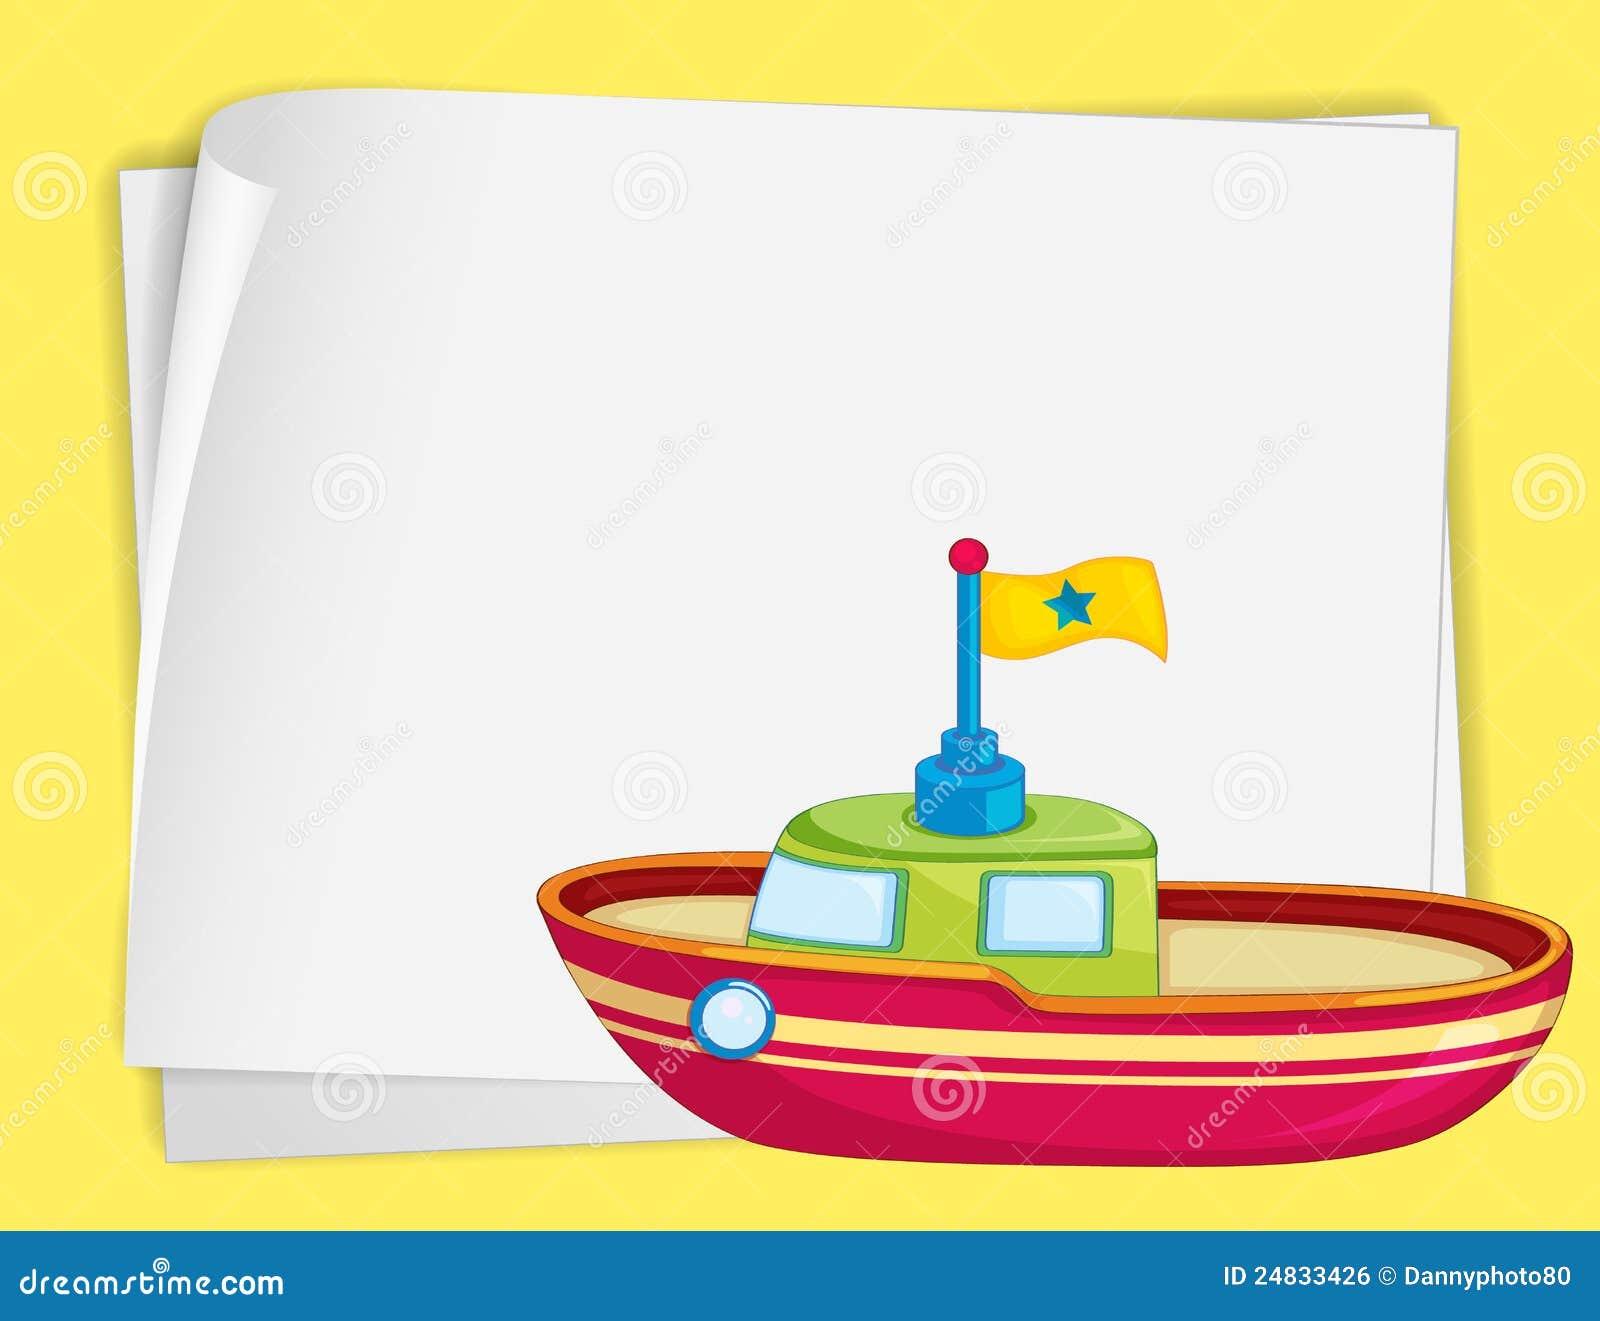 Toy Boat Royalty Free Stock Image - Image: 24833426